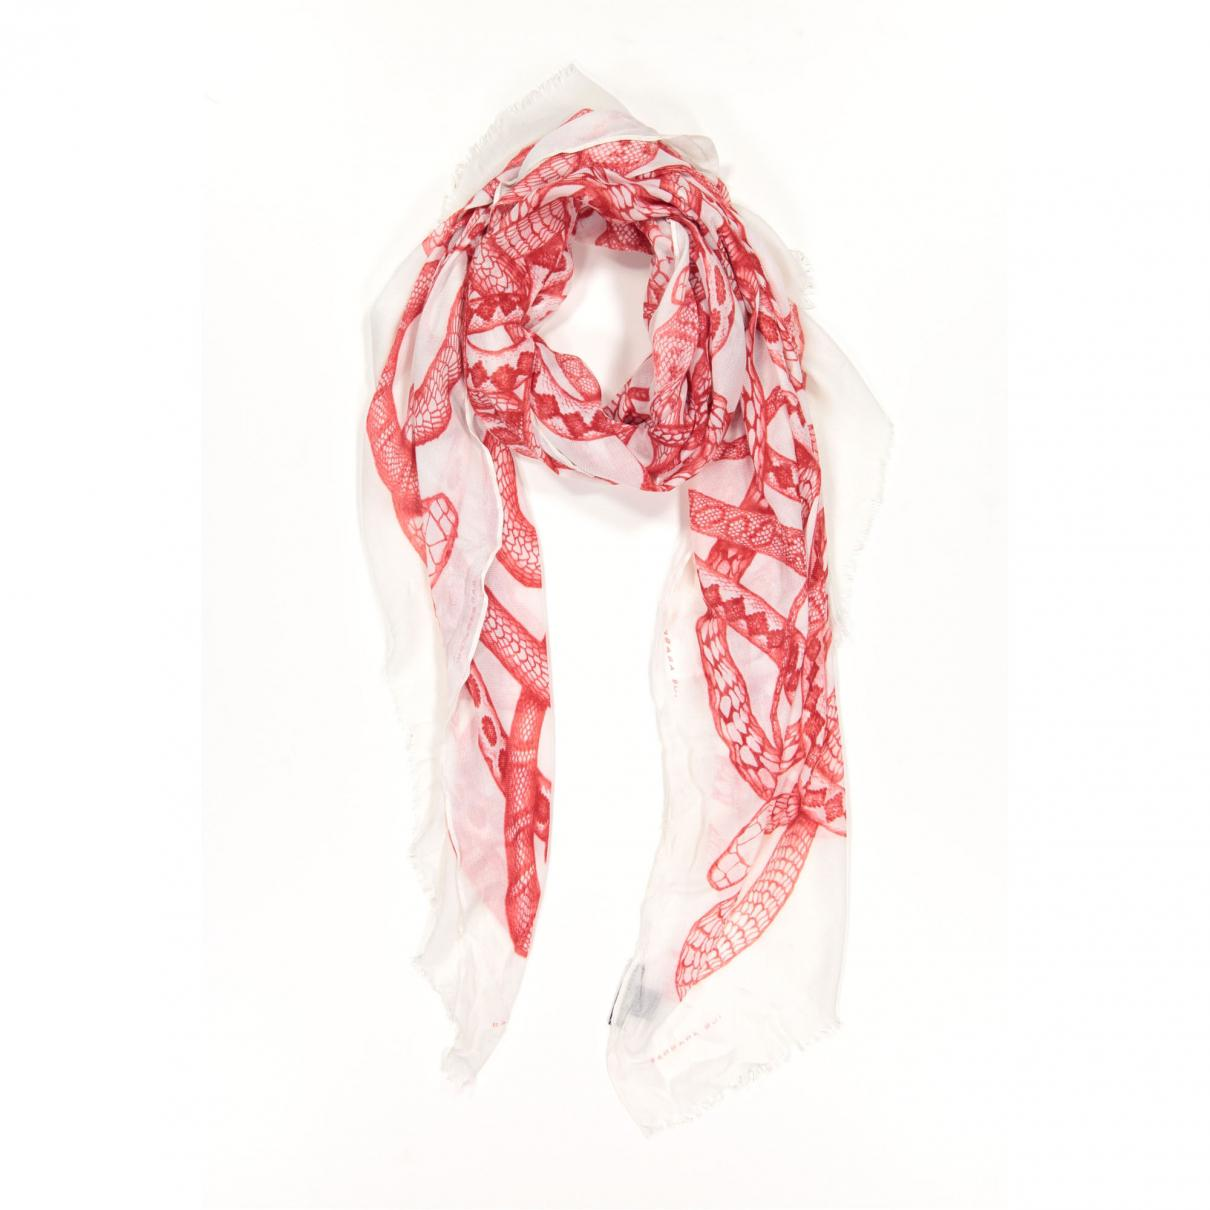 78687976df7 Lyst - Foulard Barbara Bui en coloris Blanc